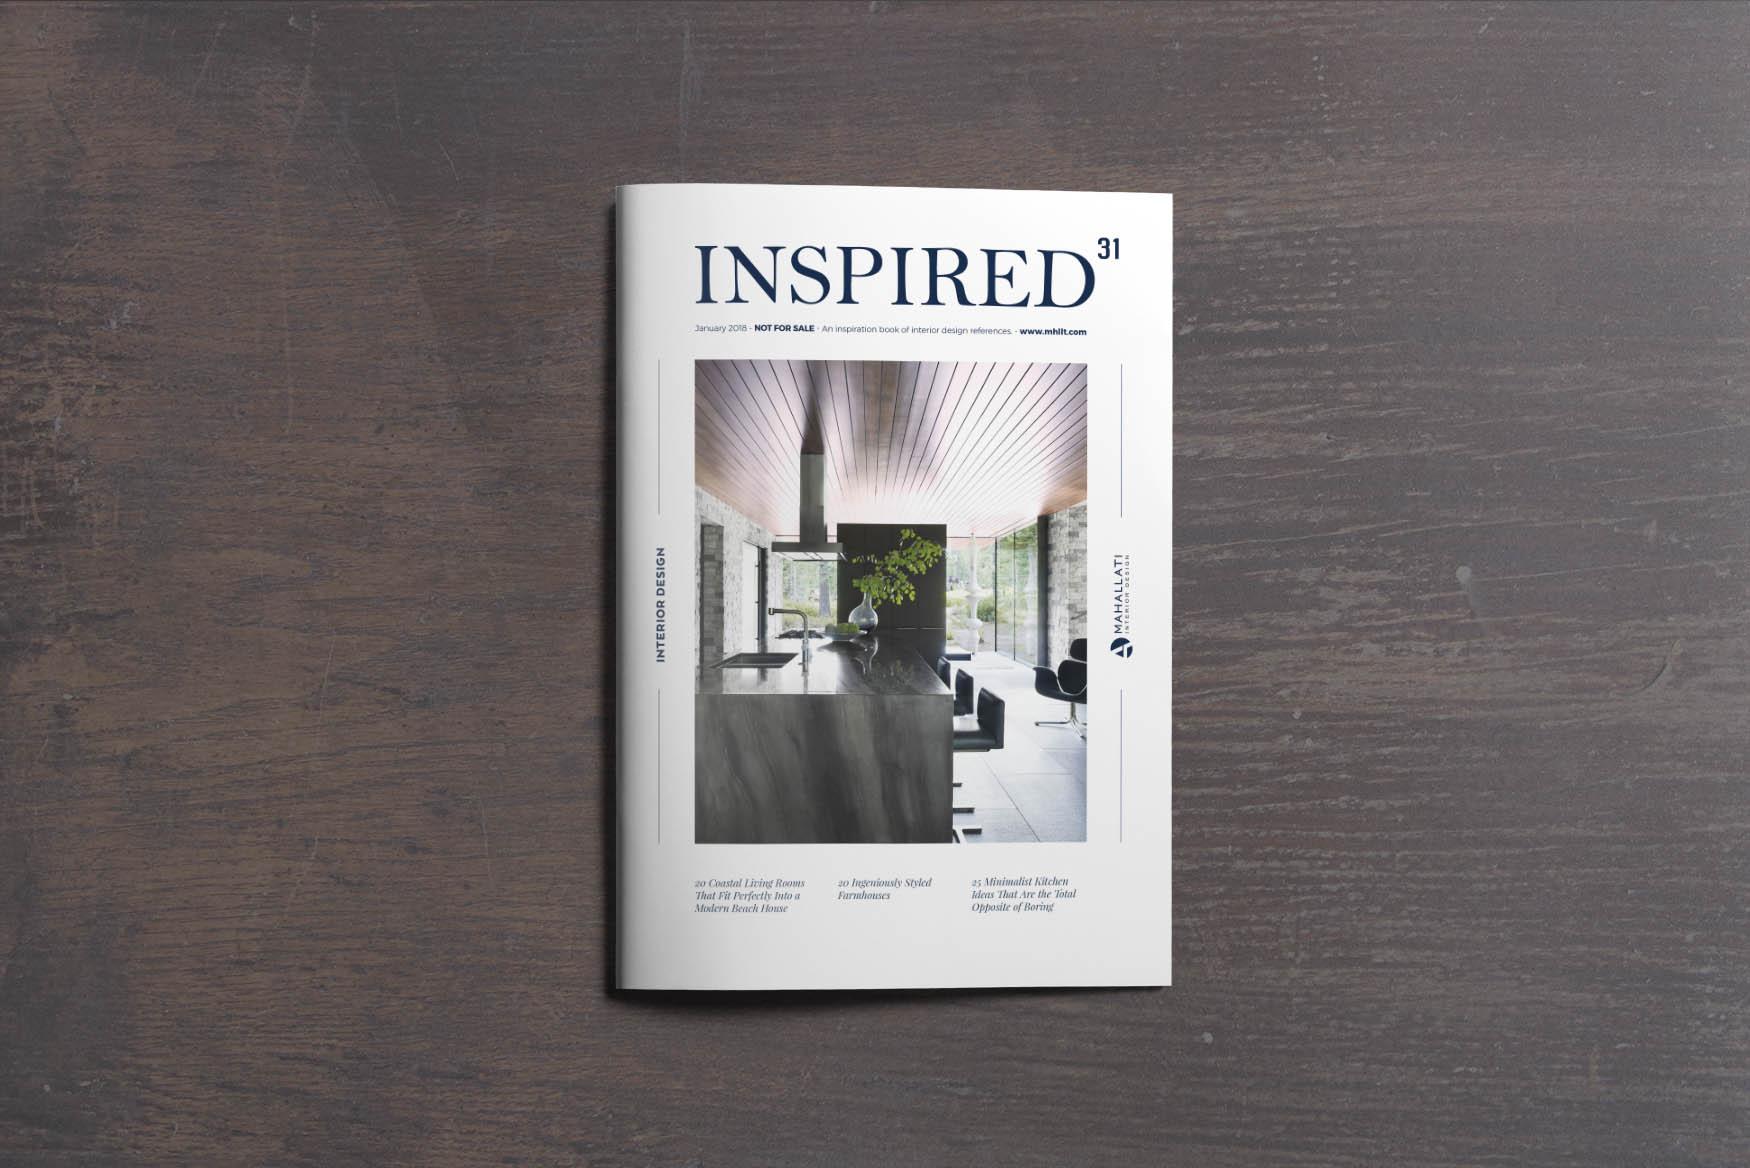 Inspired Vol 31 - January 2018